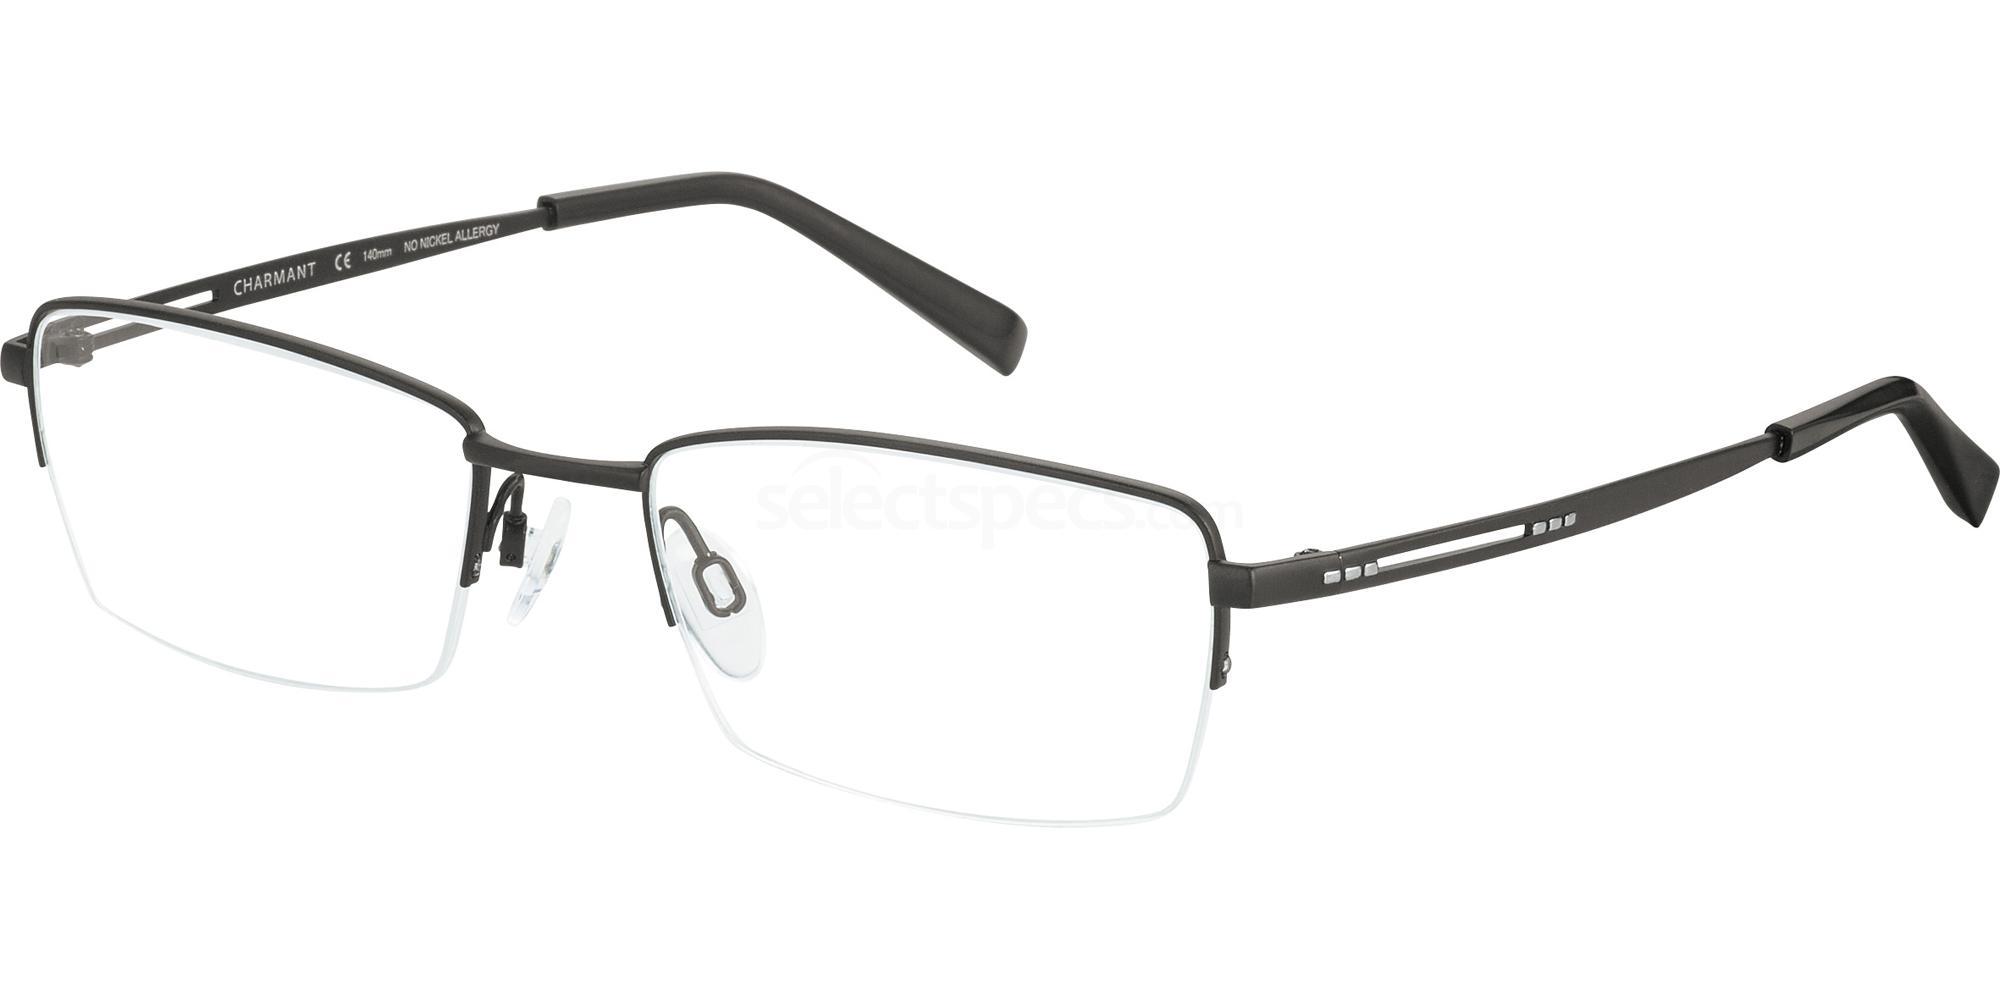 BK CH11435 Glasses, Charmant Titanium Perfection